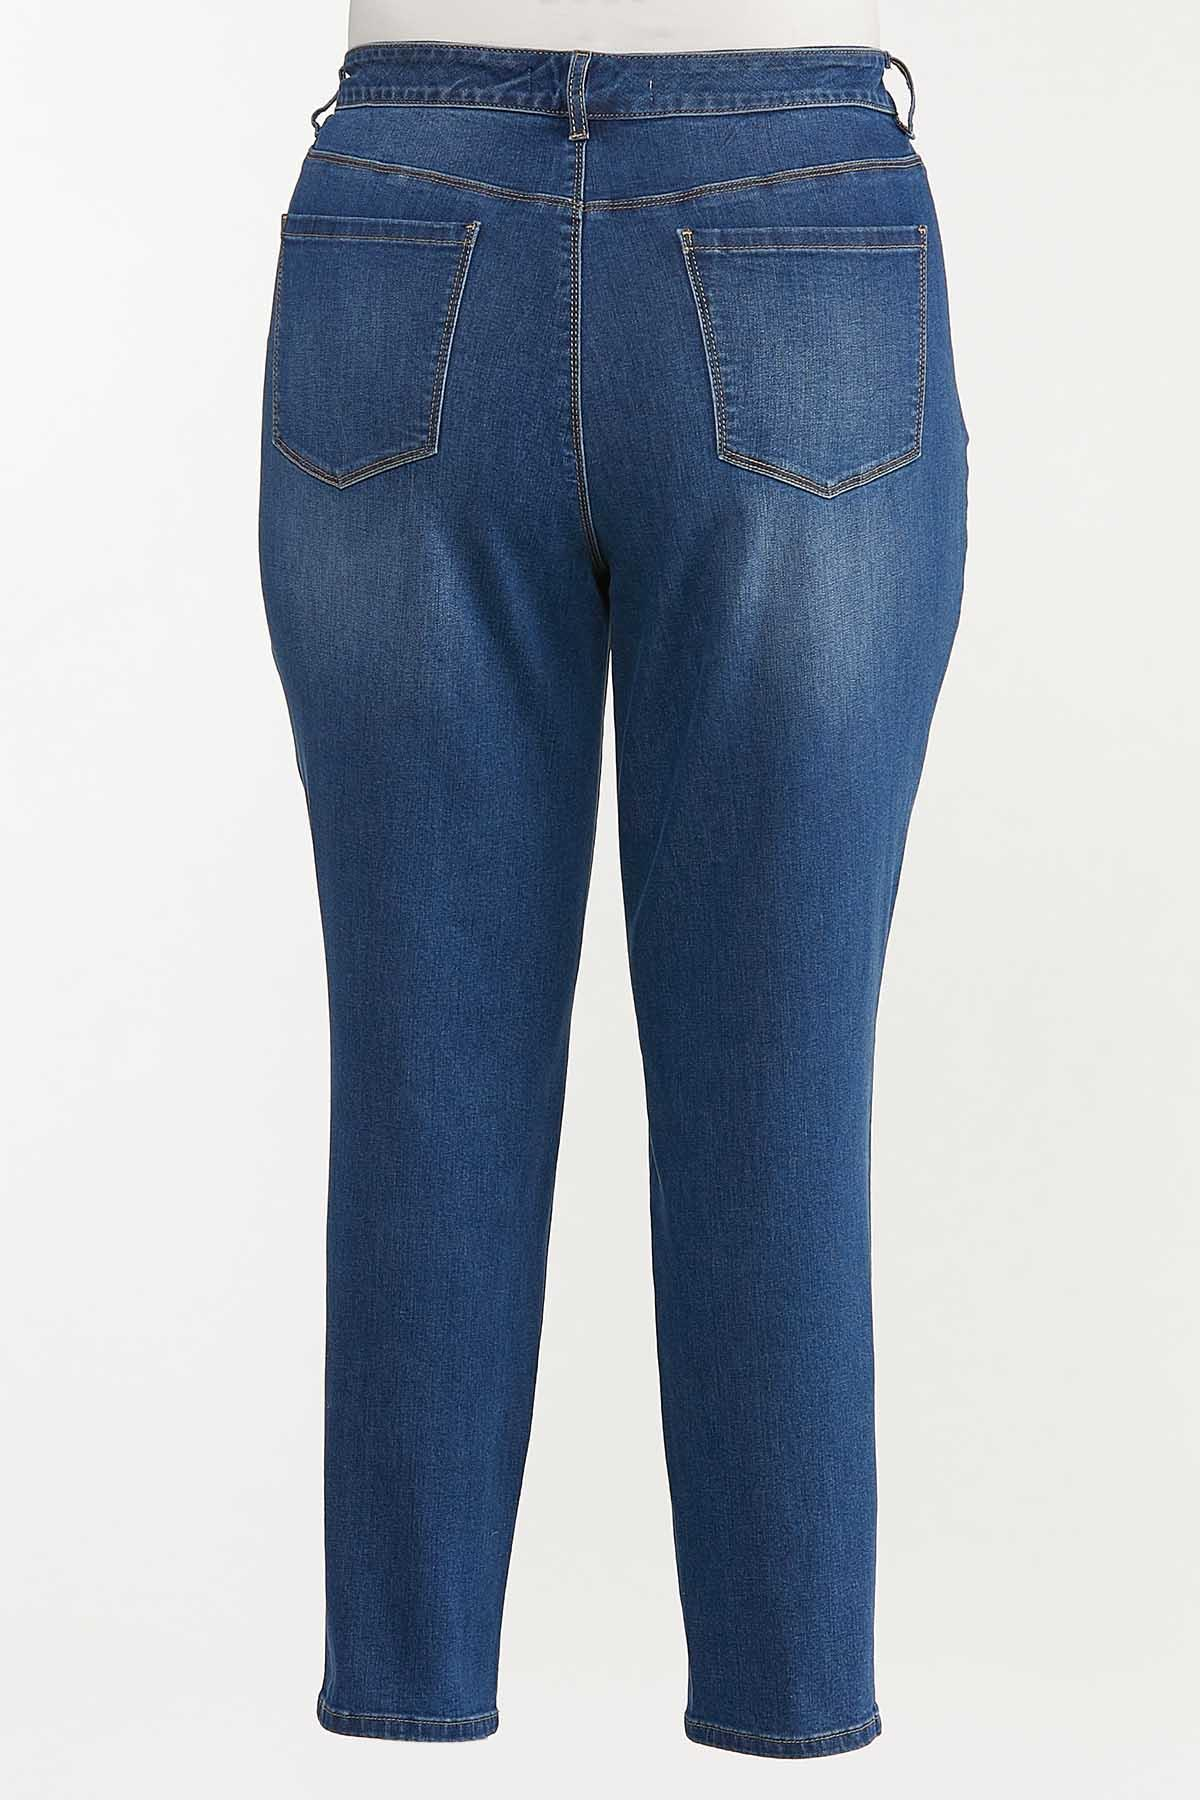 Plus Size High-Rise Medium Wash Skinny Jeans (Item #44606652)